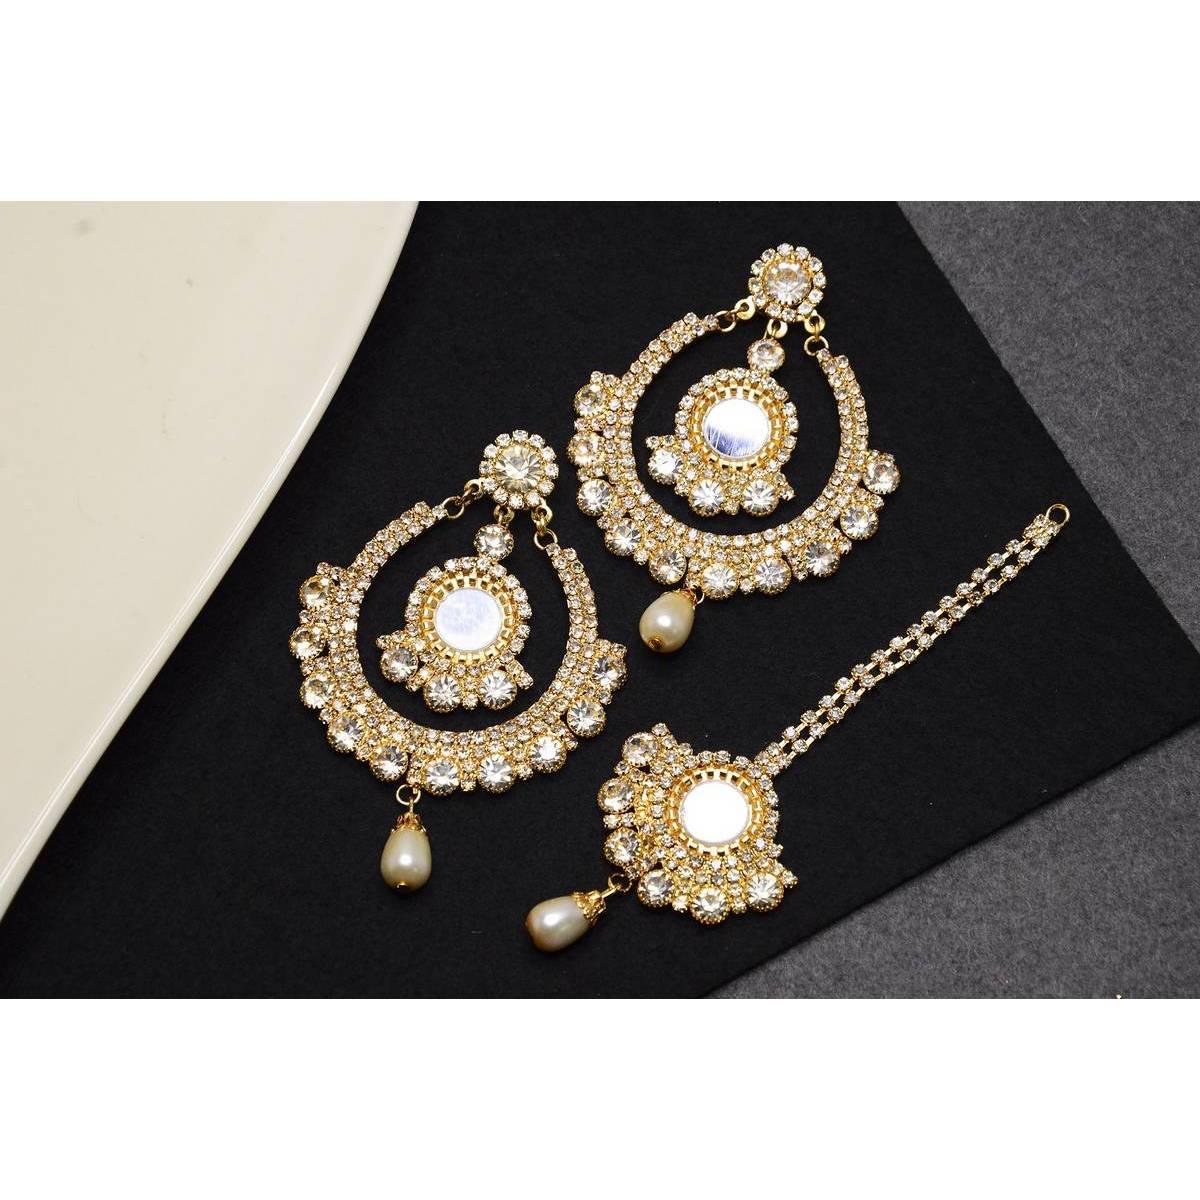 Golden Jewellery Set with Earings and Bindia/ Teeka for Girls, Women and Ladies